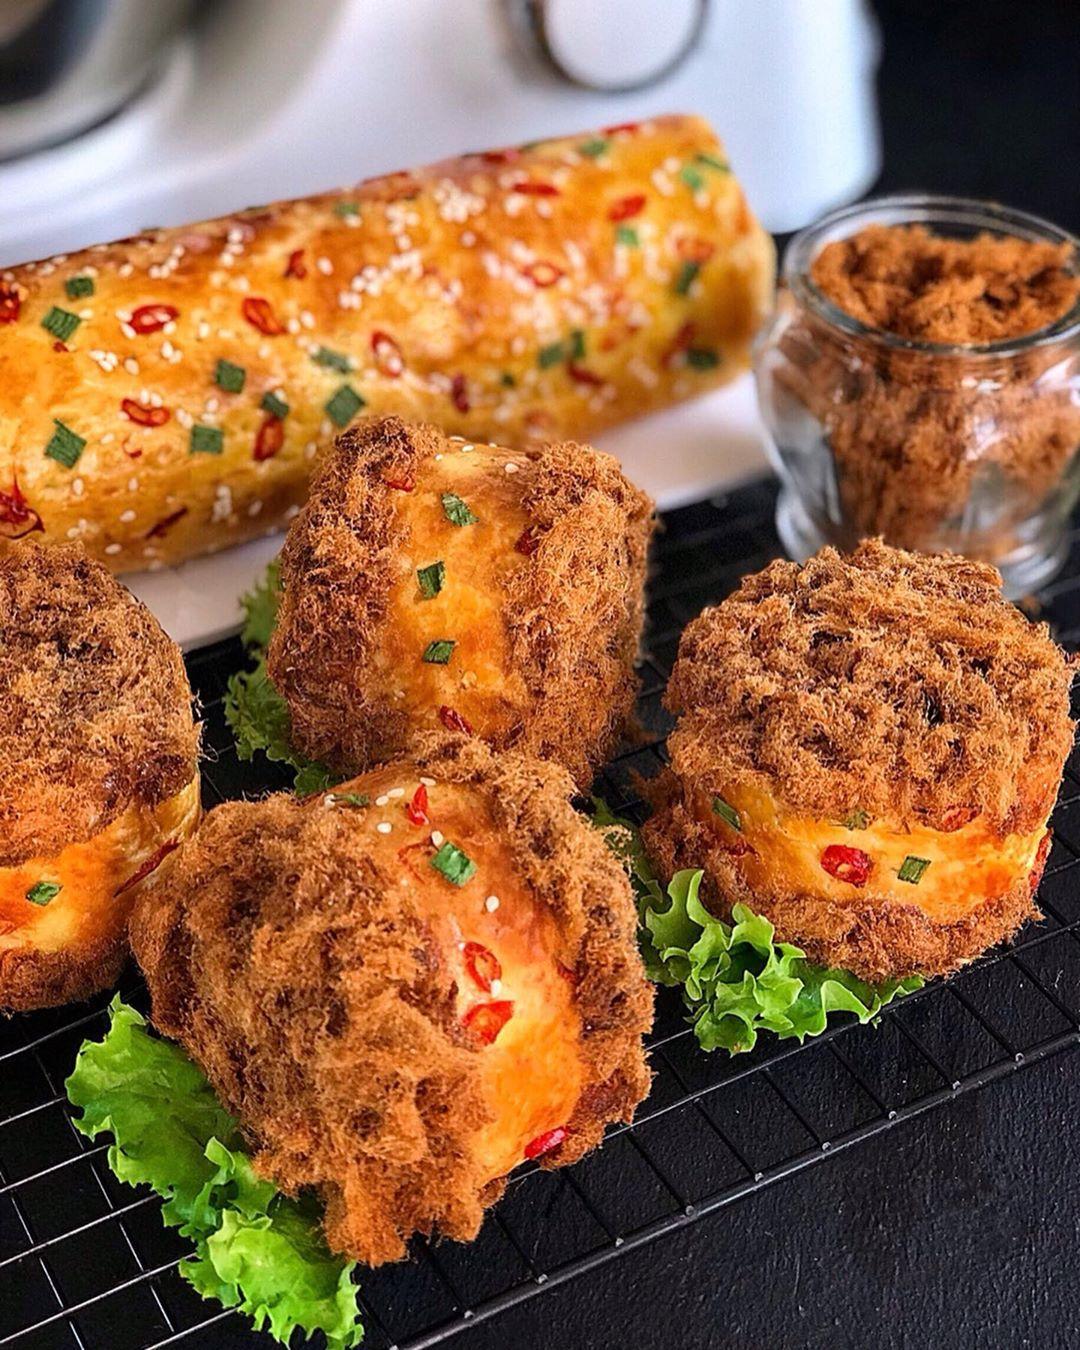 Resep Roti Gulung Abon Ala Breadtalk Yang Enak Dan Anti Gagal Resep Roti Resep Ide Makanan